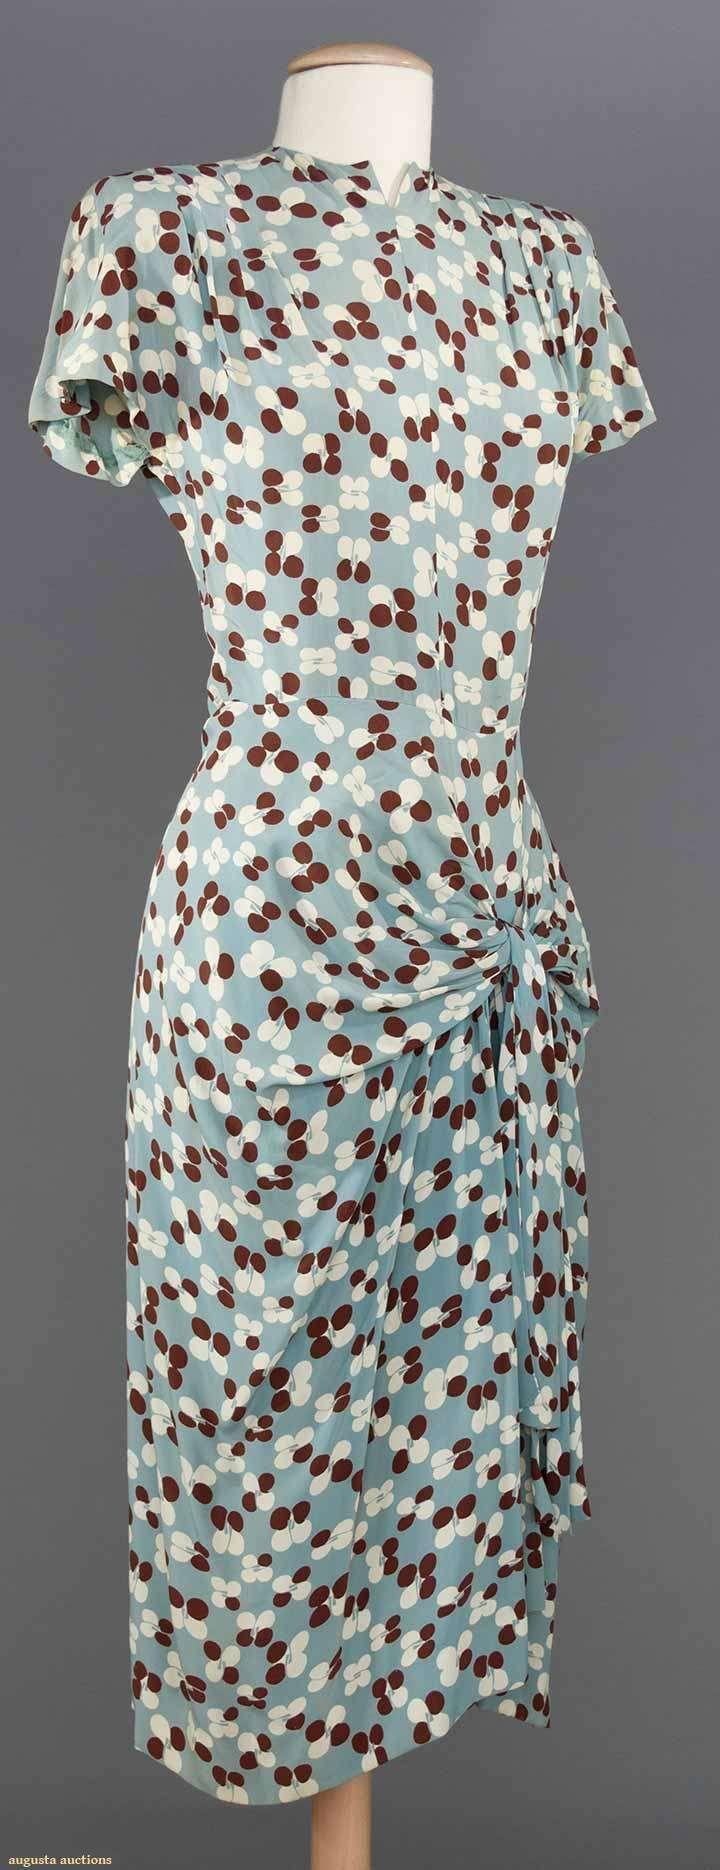 "PRINTED SILK DAY DRESS, 1940s blue grey w/ white & chocolate petals, sarong skirt, B 32"", W 26"", L 42"""